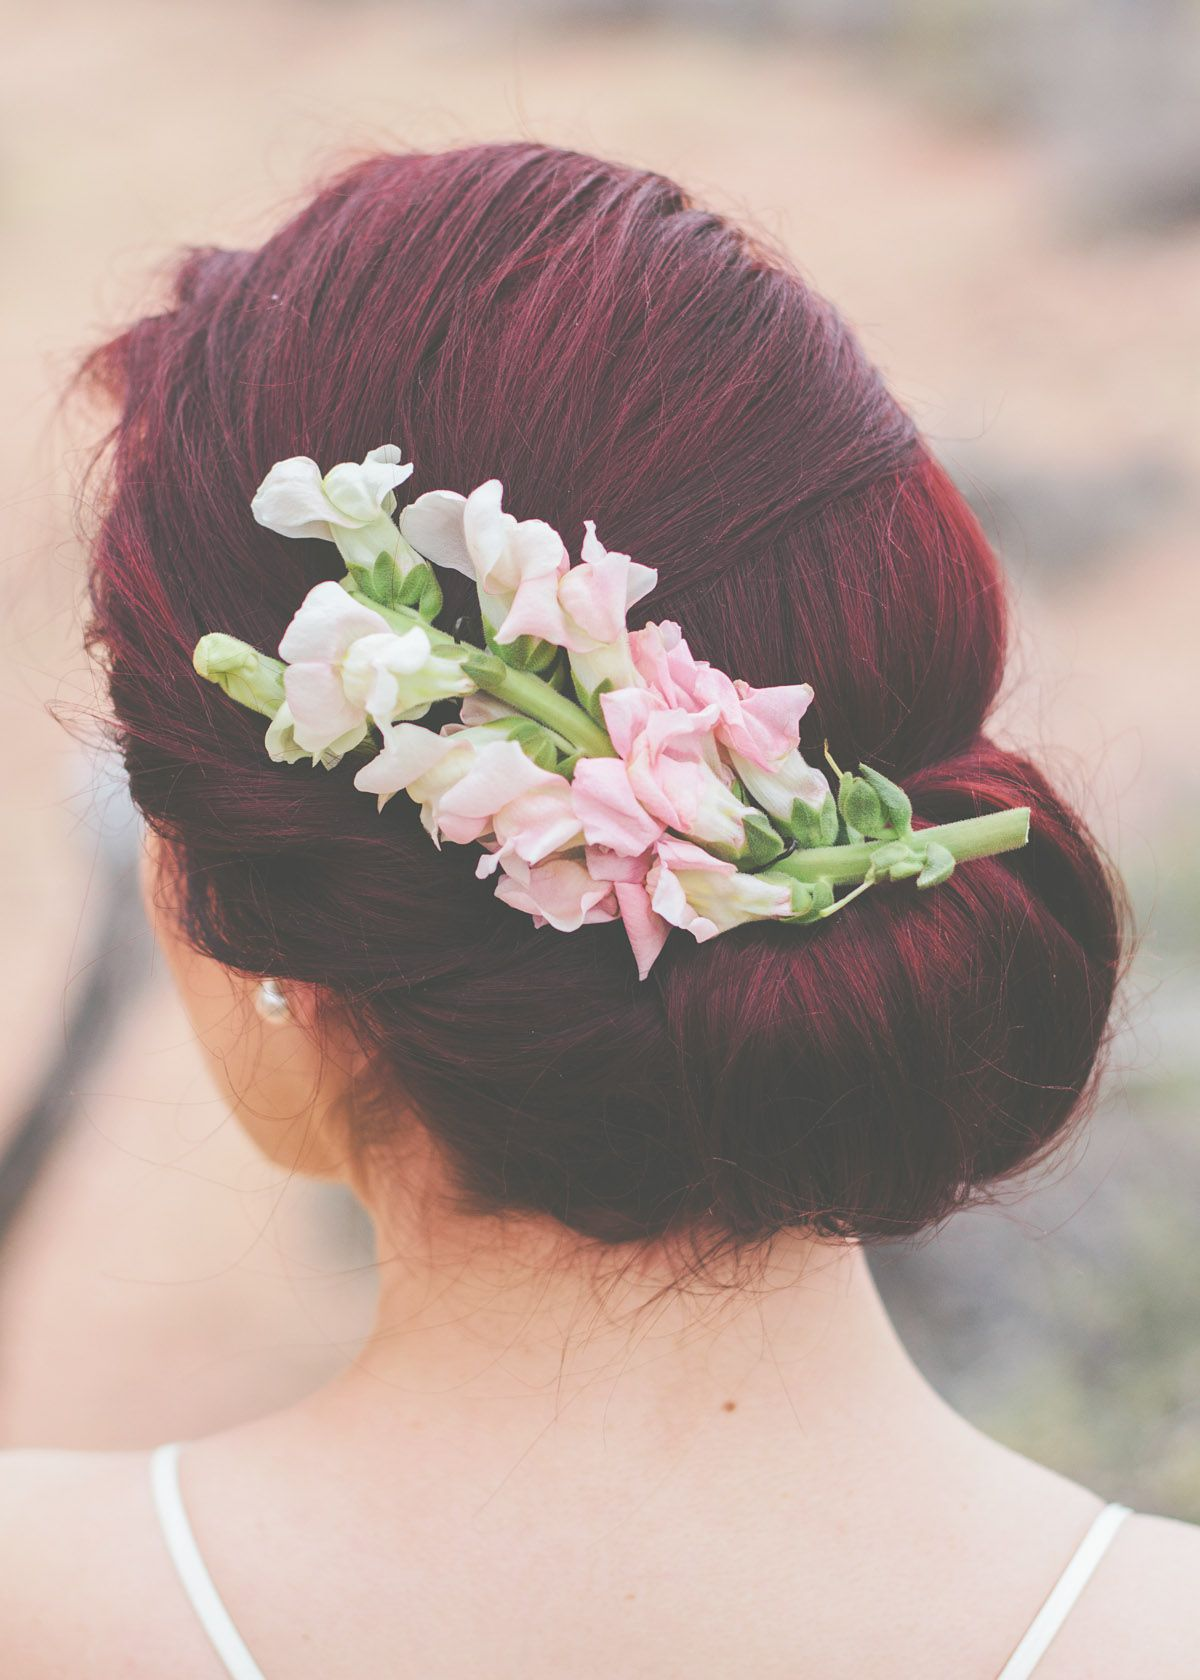 Bridal up-do hairstyle  http://eatsleepbeauty.com/